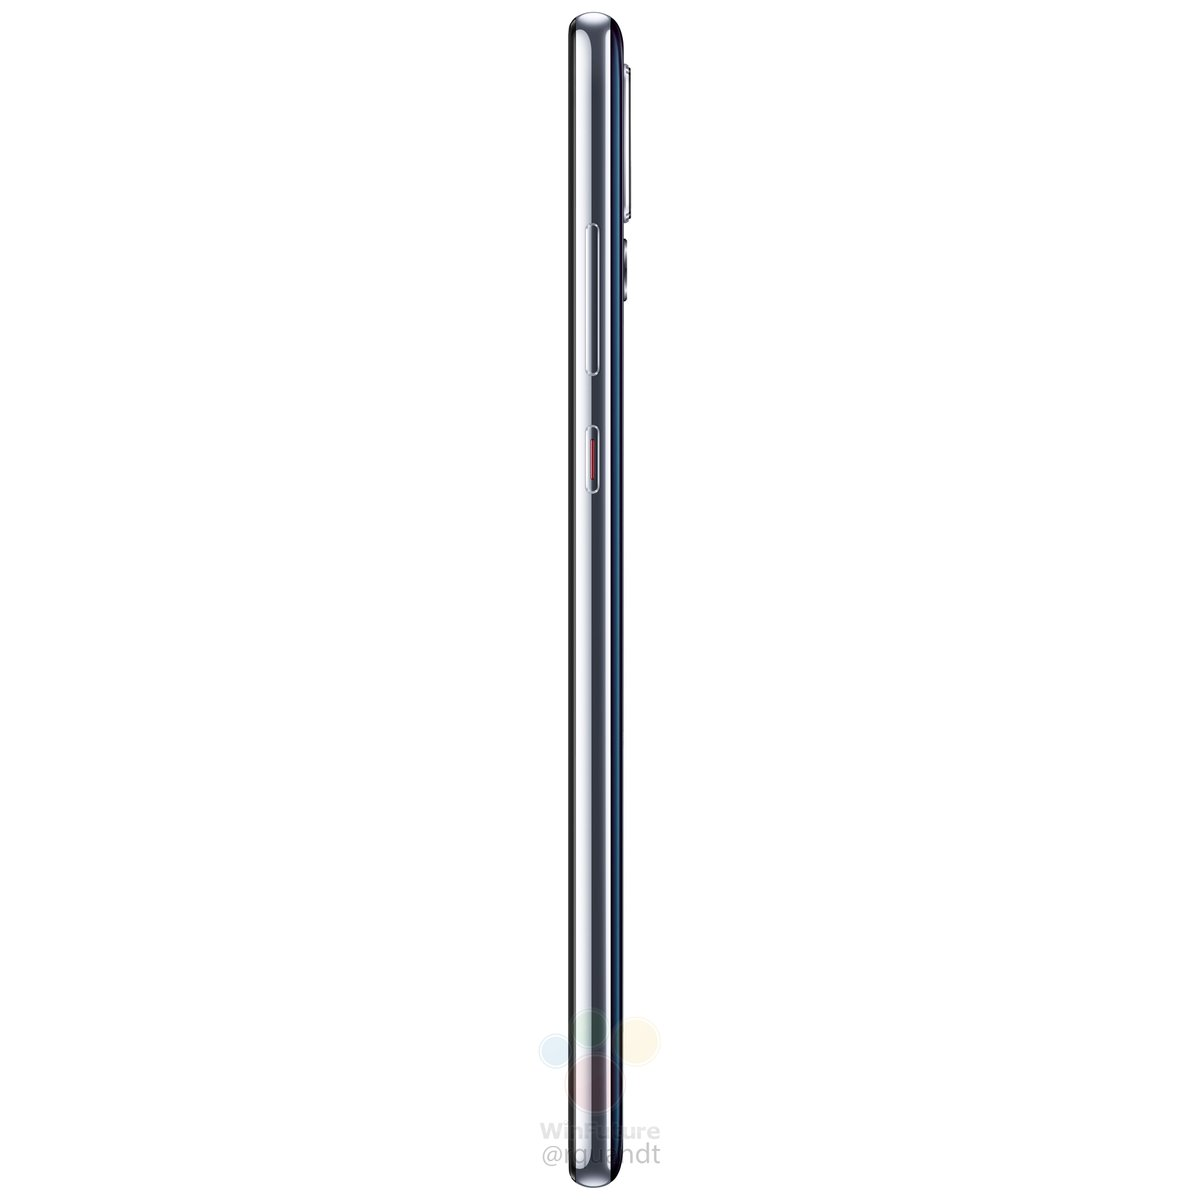 Huawei-P20-Pro-10